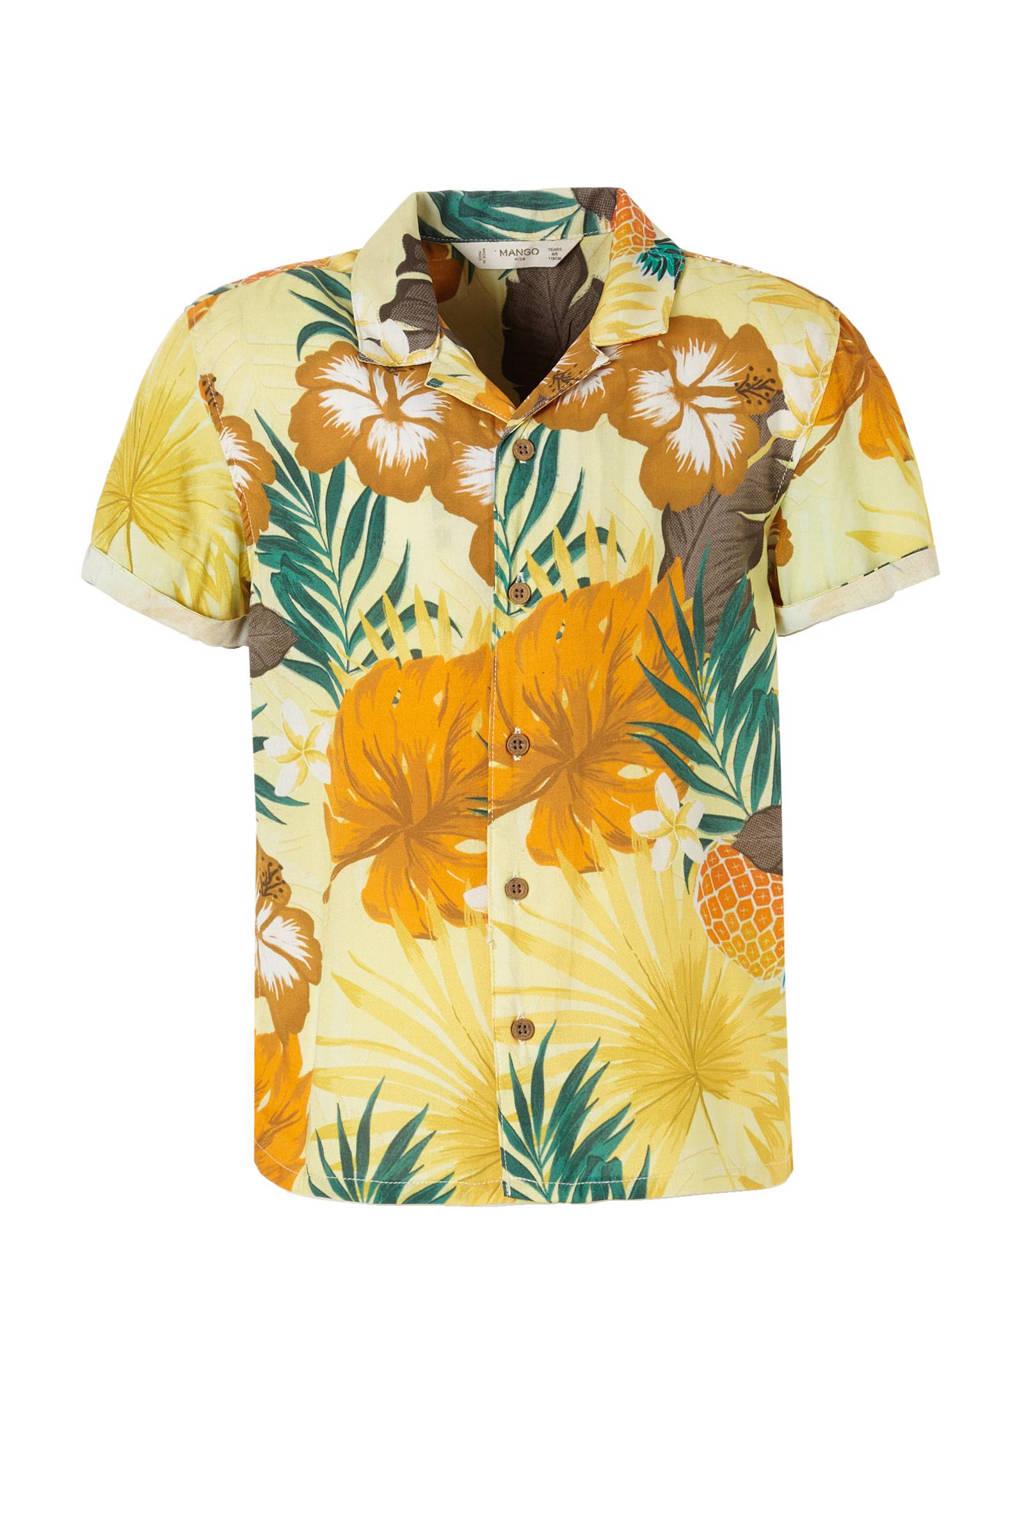 a7ce5602aae7f5 Mango Kids overhemd met Hawaii print geel   wehkamp